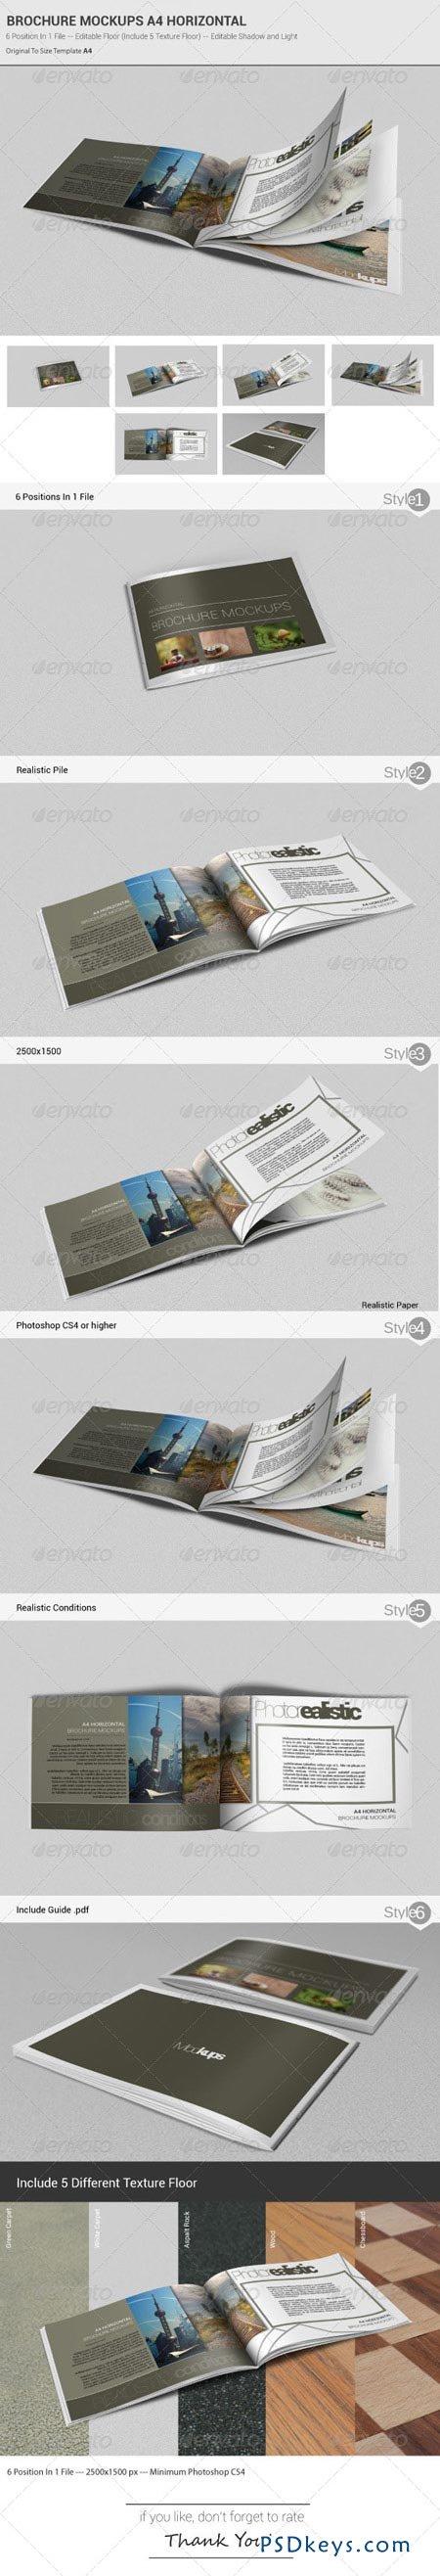 horizontal brochure design - brochure mockups a4 horizontal 4988223 free download